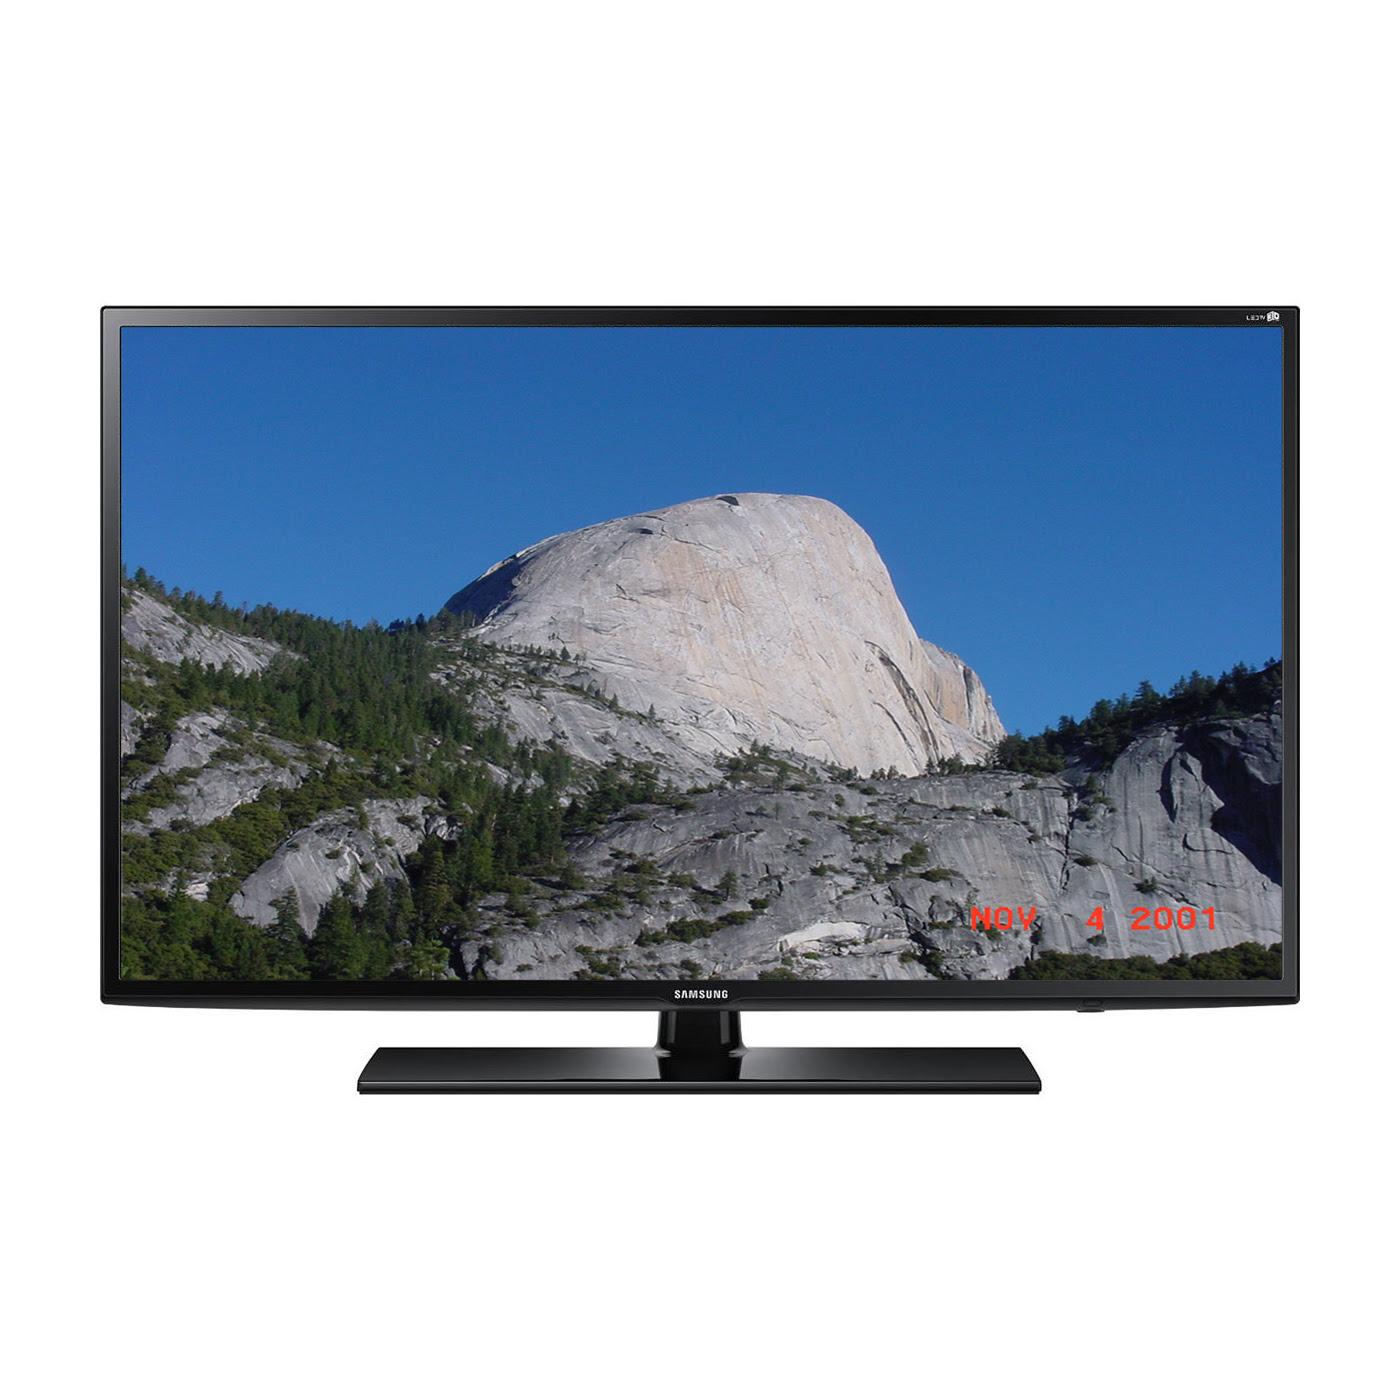 Samsung Refurbished 55 Class 1080p LED Smart Hdtv - UN55H6203